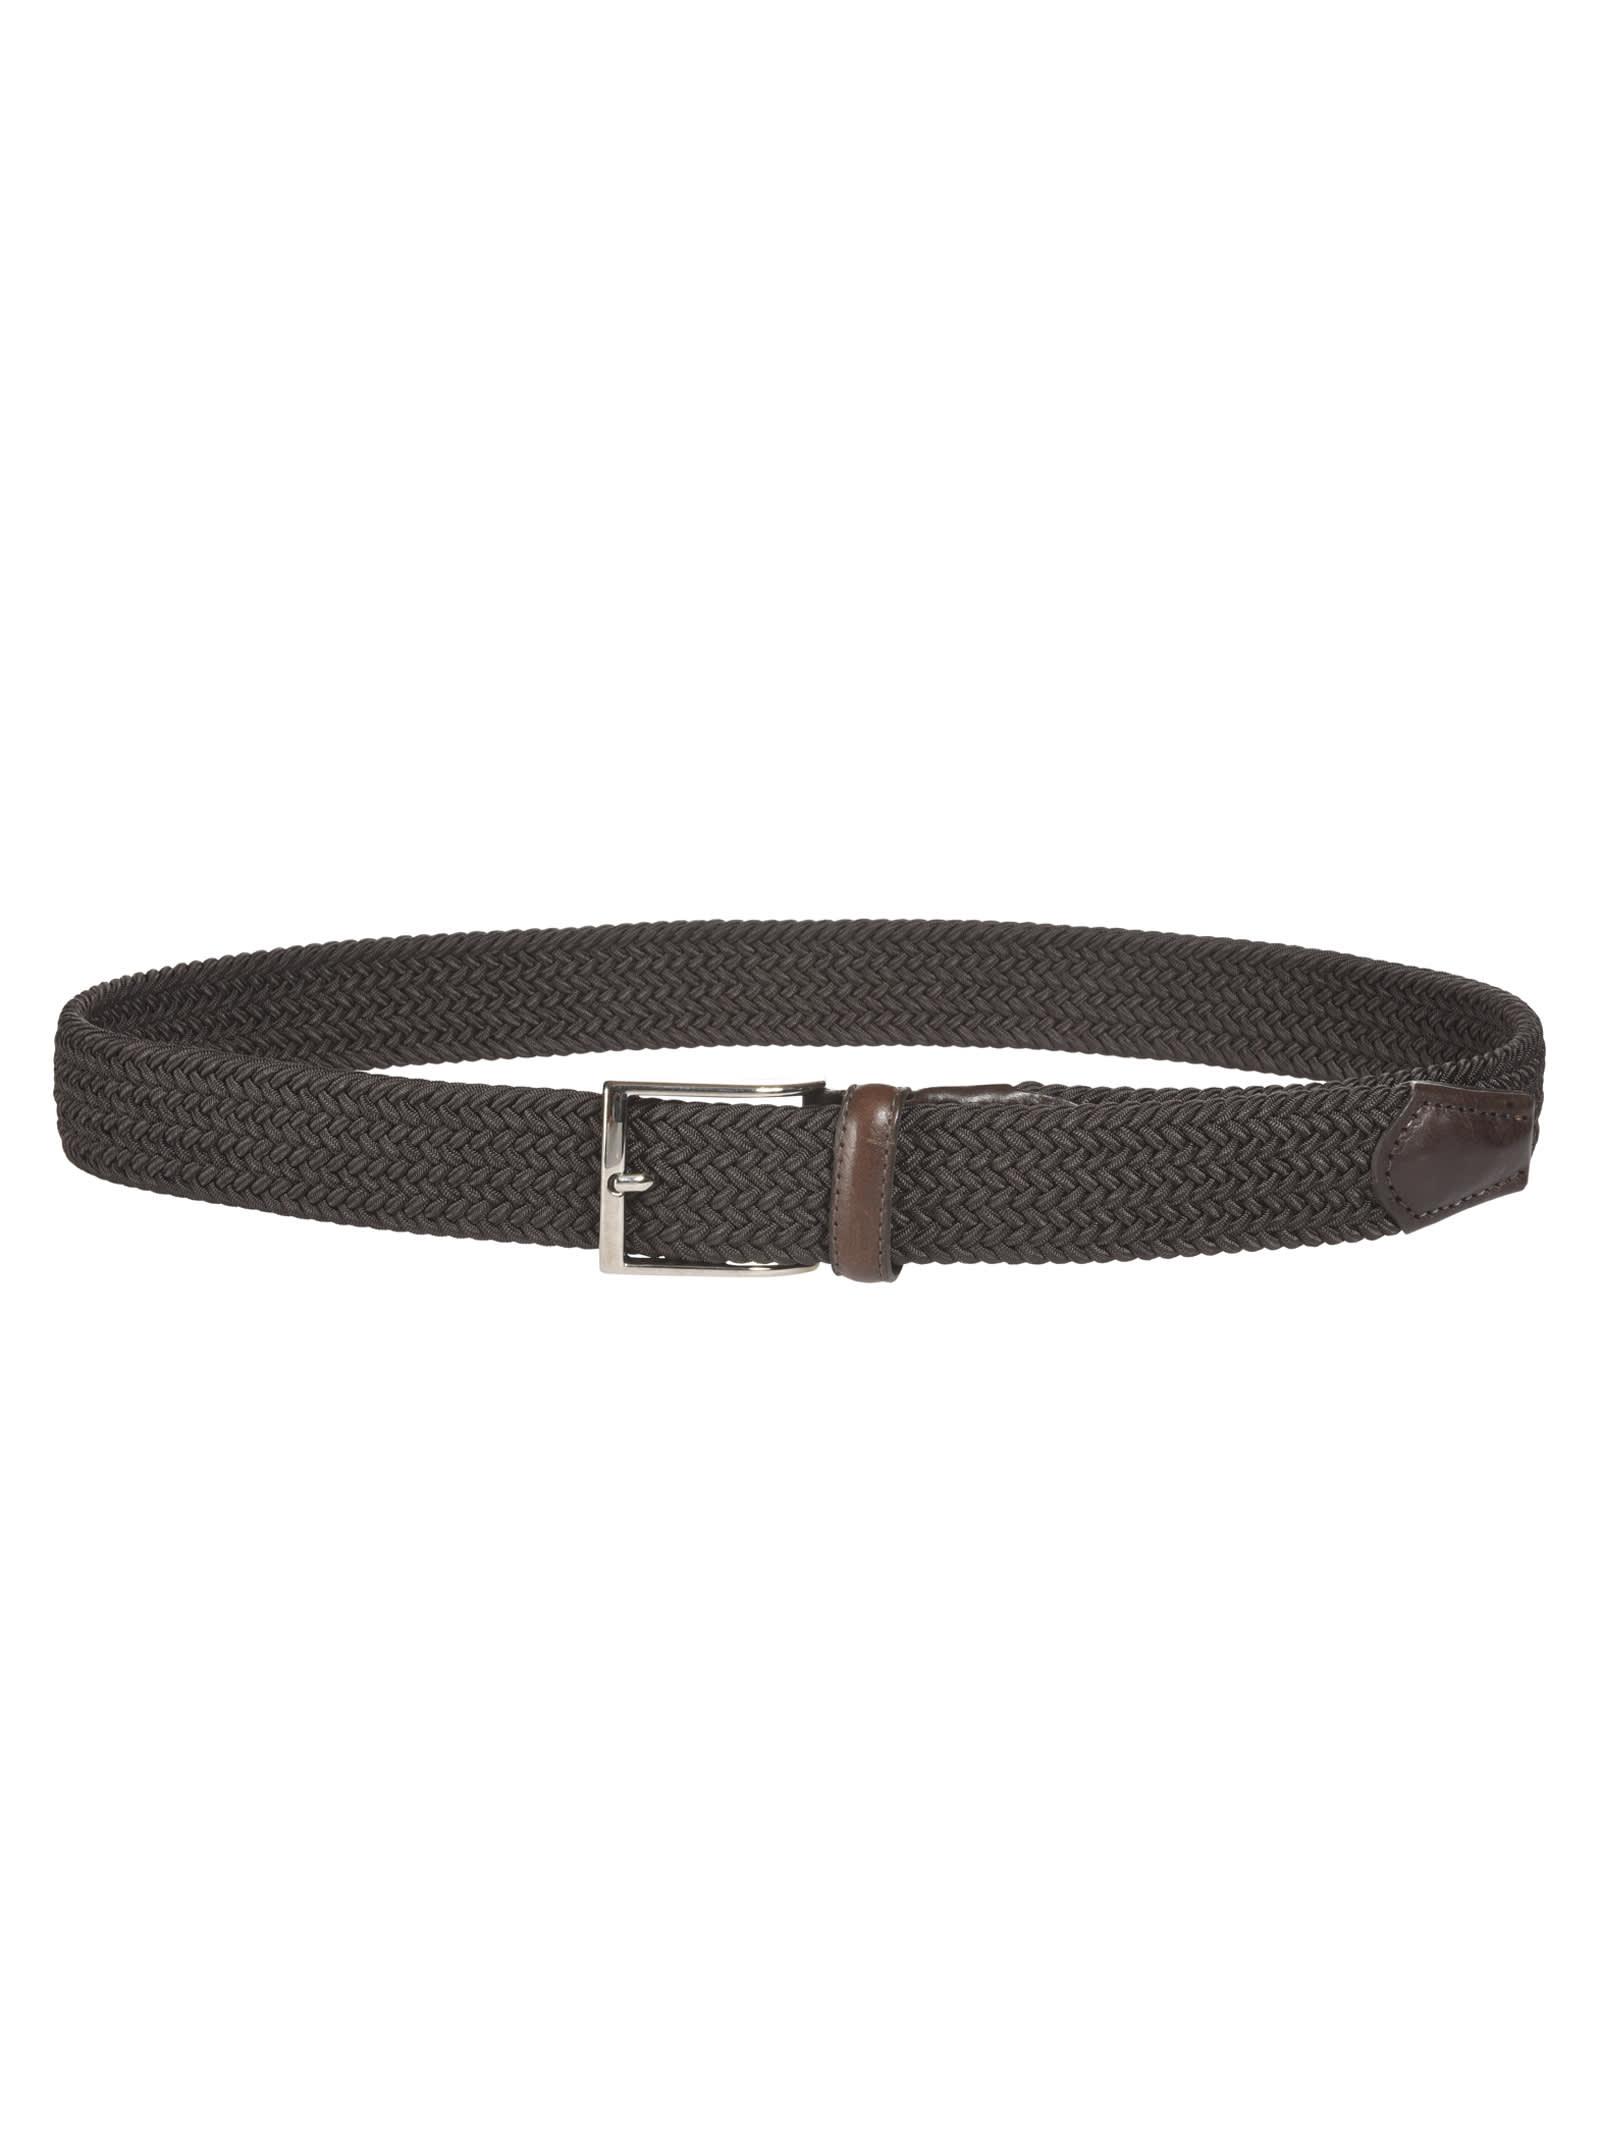 Woven Buckled Belt